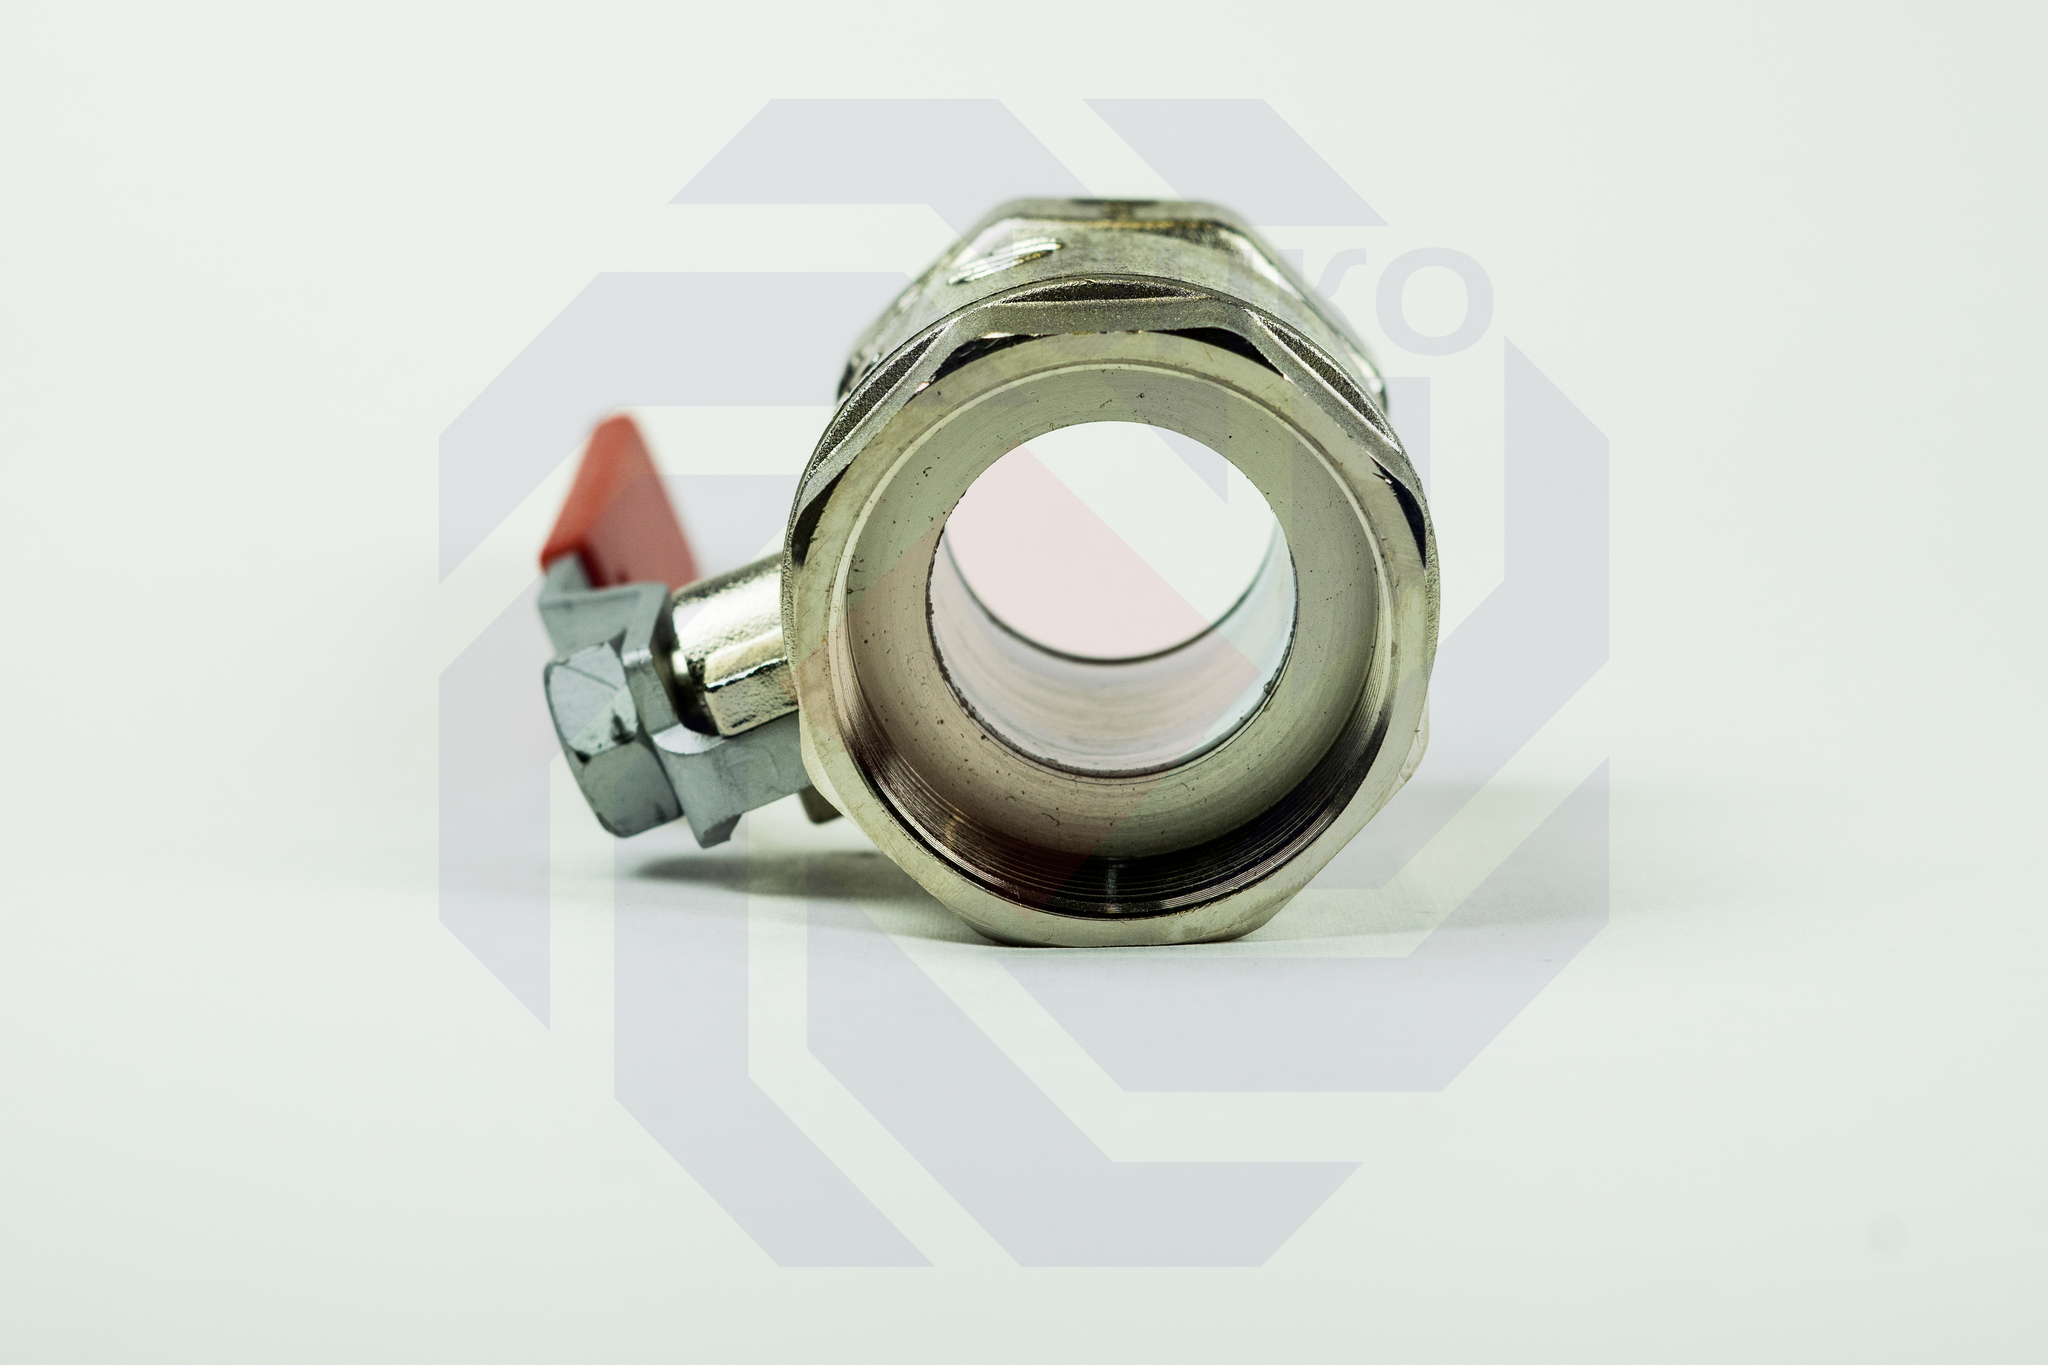 Кран шаровой с ВР/ВР резьбой ARCO NILE 2